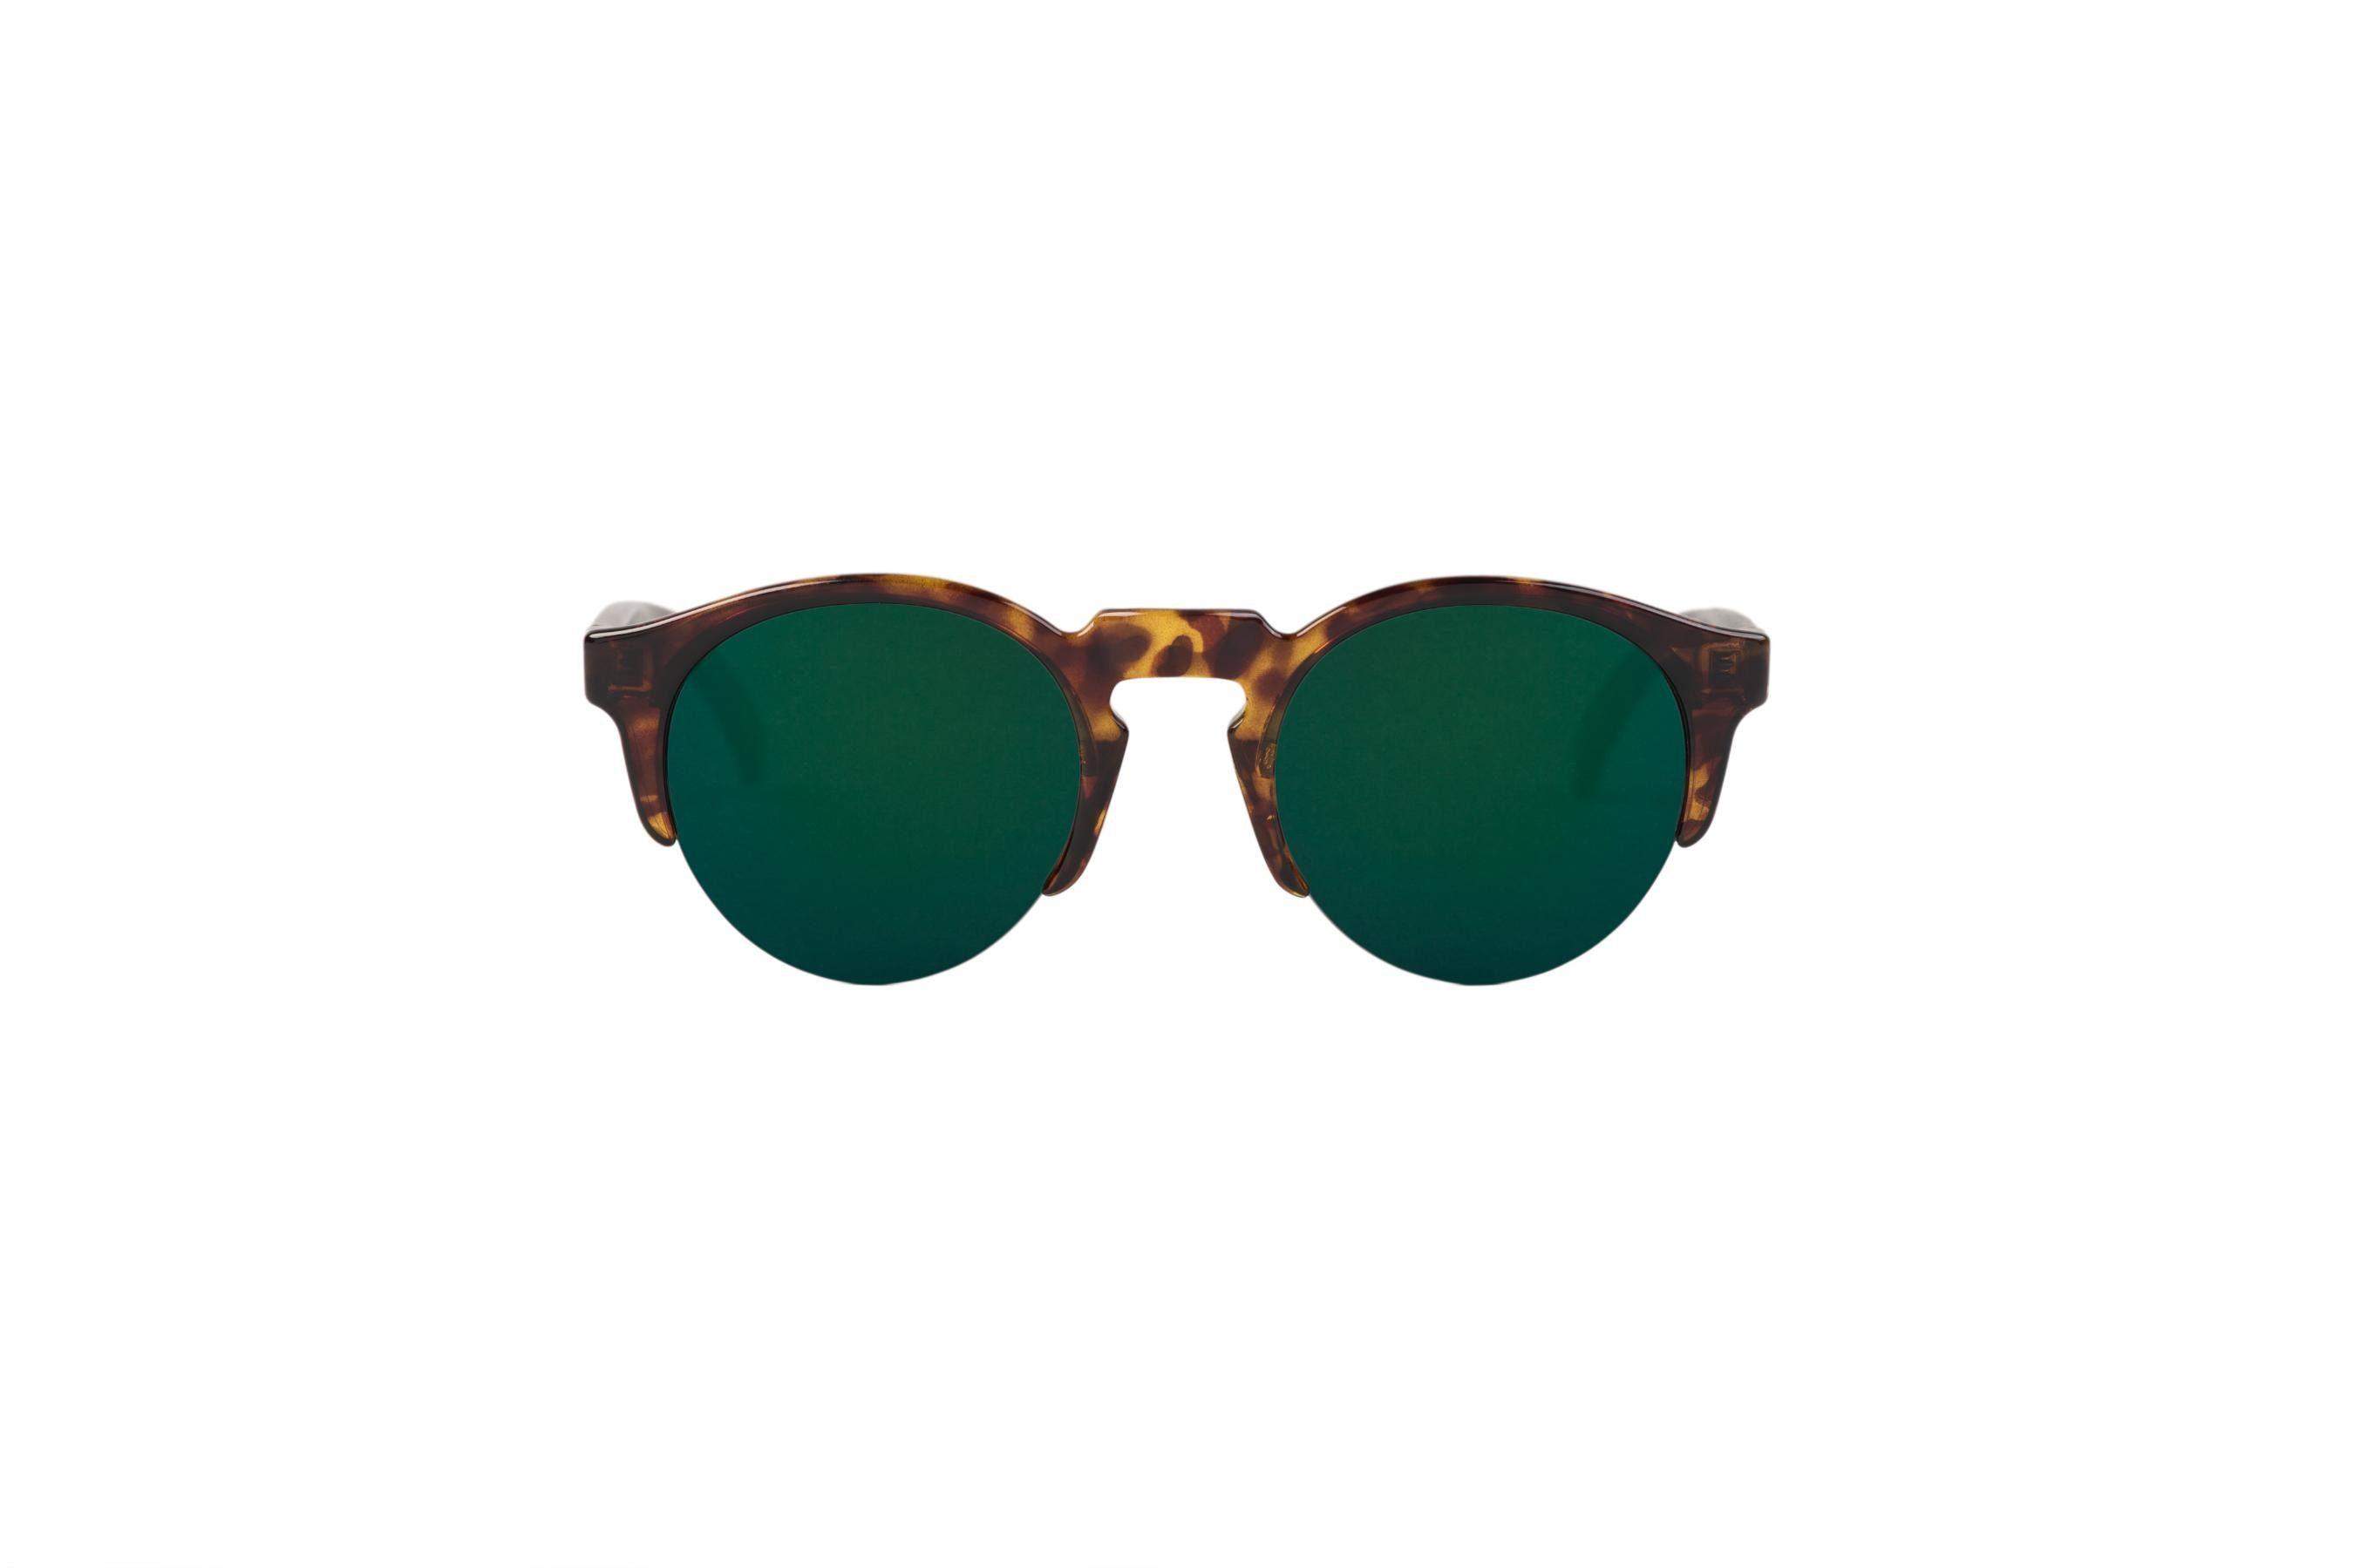 Mr. Boho Sonnenbrille »Cheetah Tortoise Born mit dunkelgrünen Gläsern«